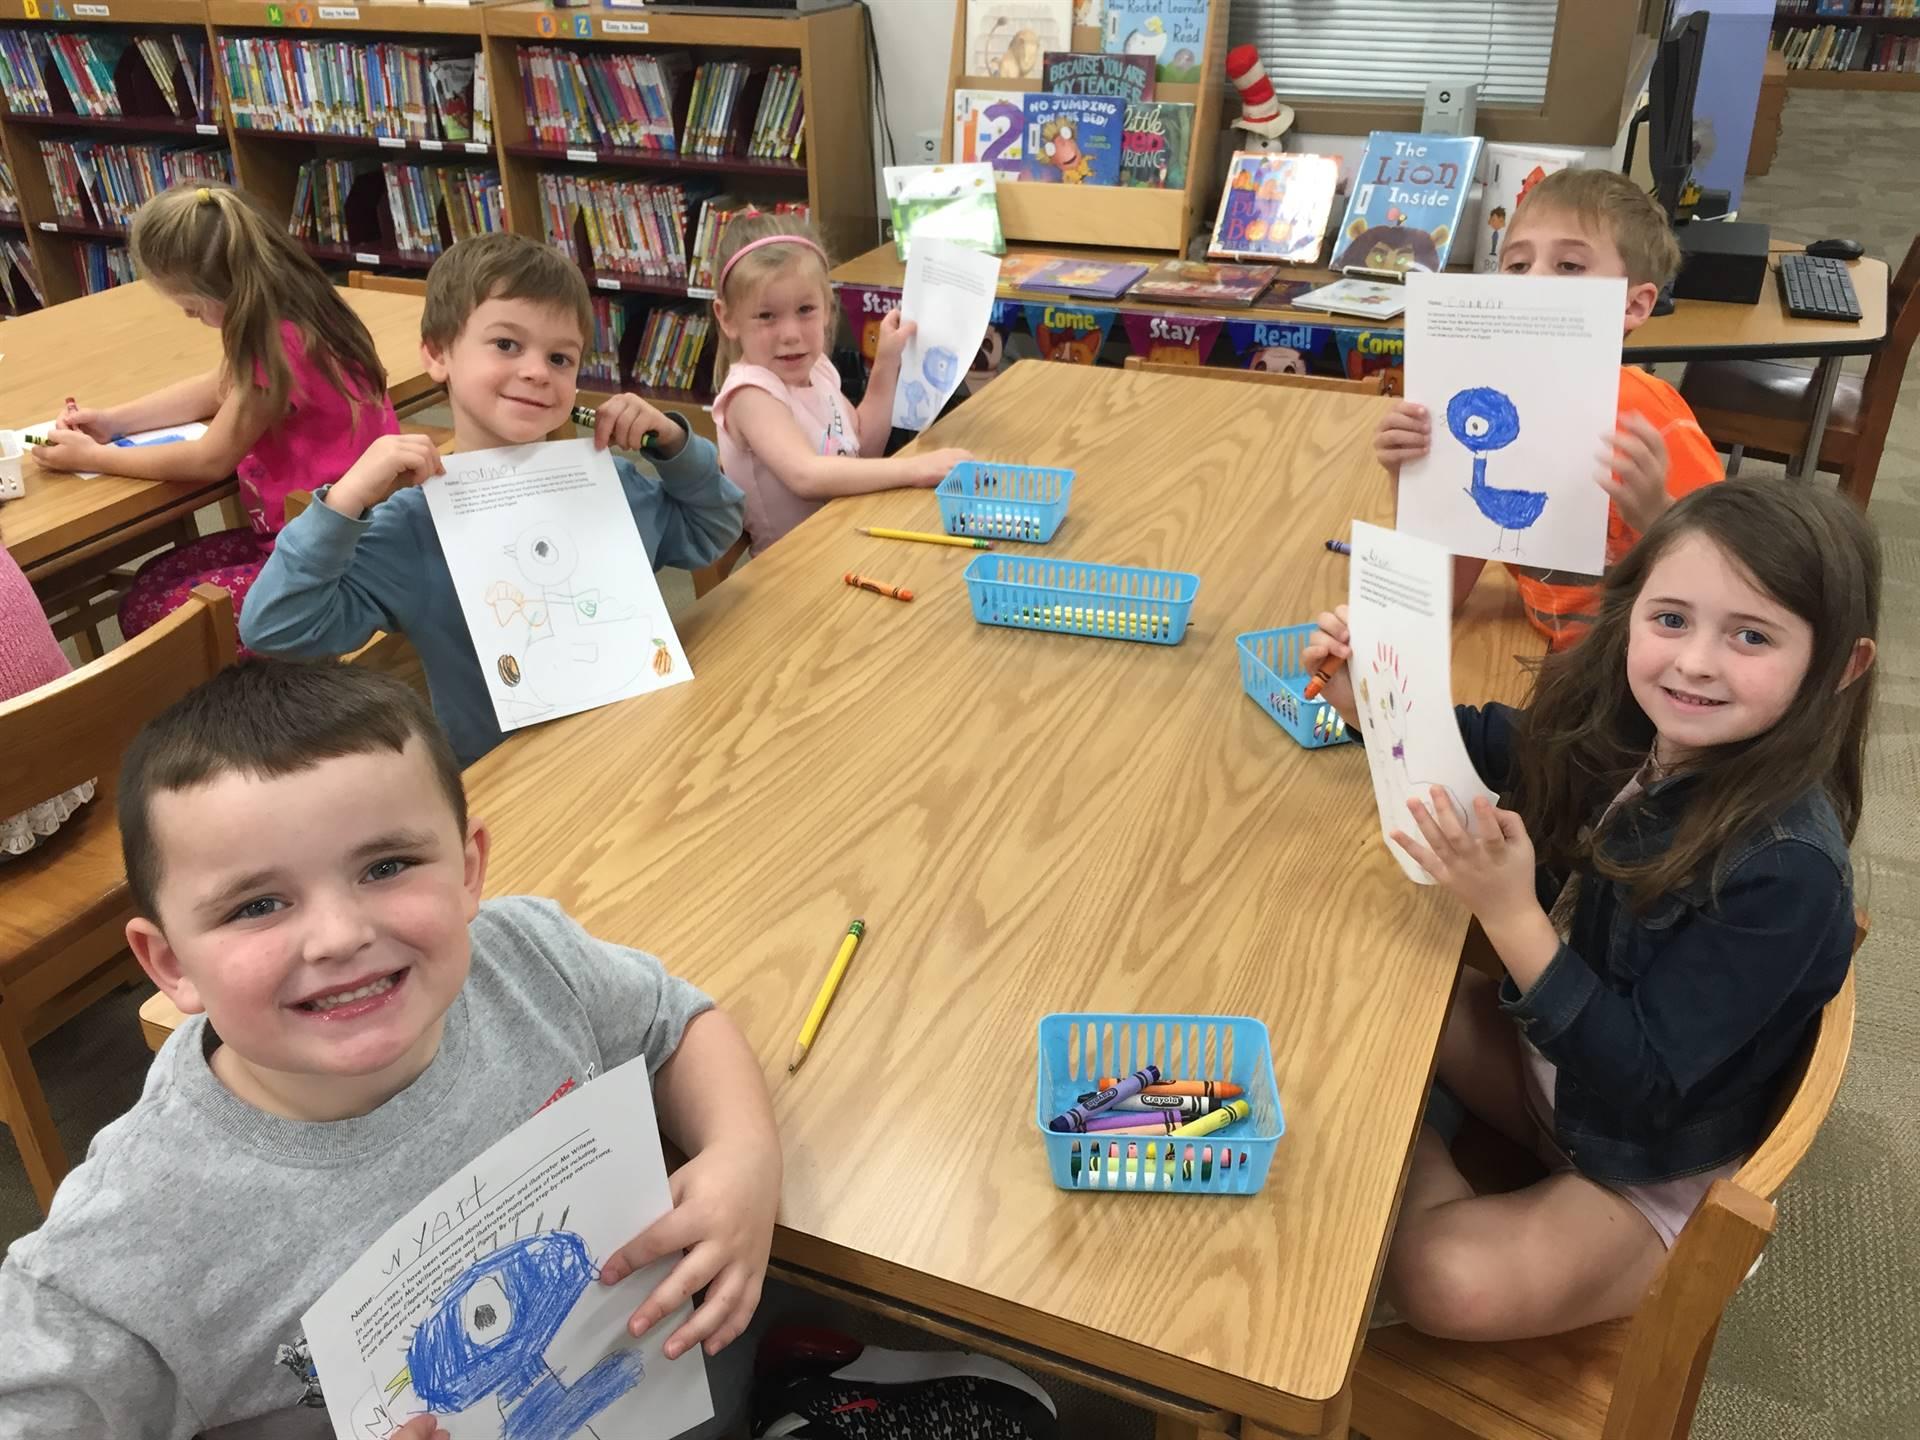 Five Kindergarten students holding up their work